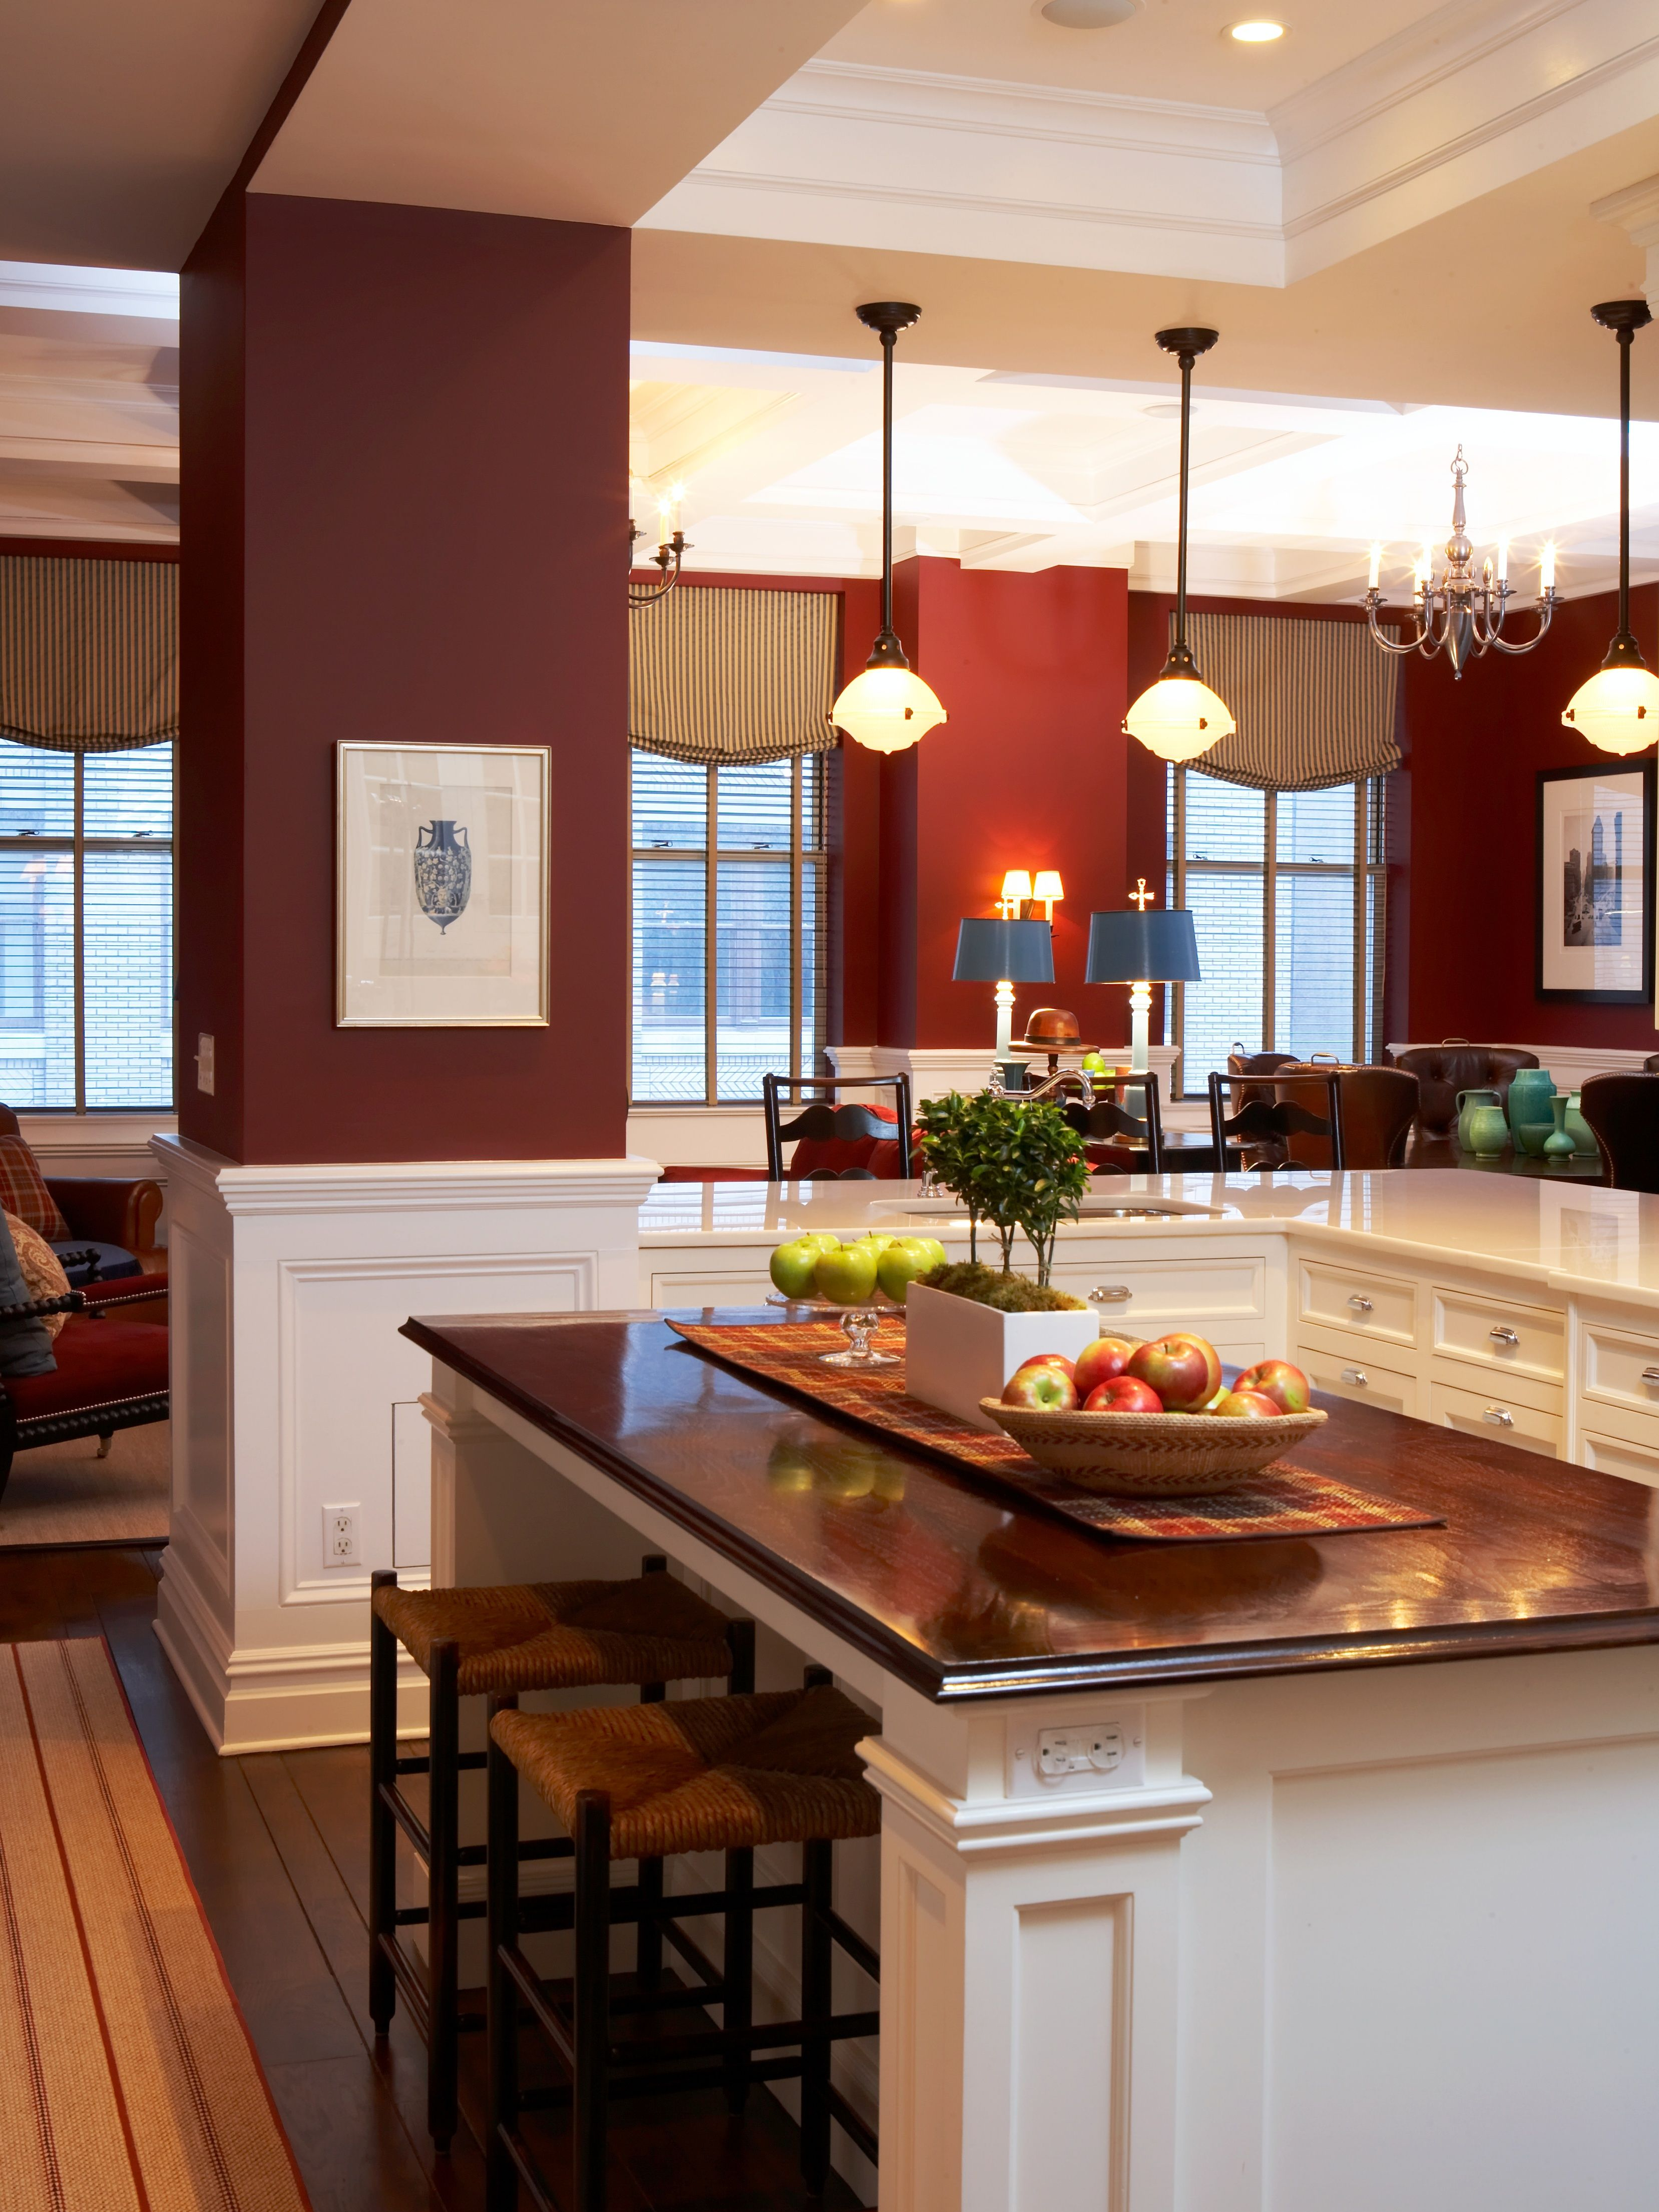 Transitional Kitchen With Dark Red Walls White Painted Wood Work Dark Counter Tops Scott Kitchen Countertops Diy Countertops Replacing Kitchen Countertops